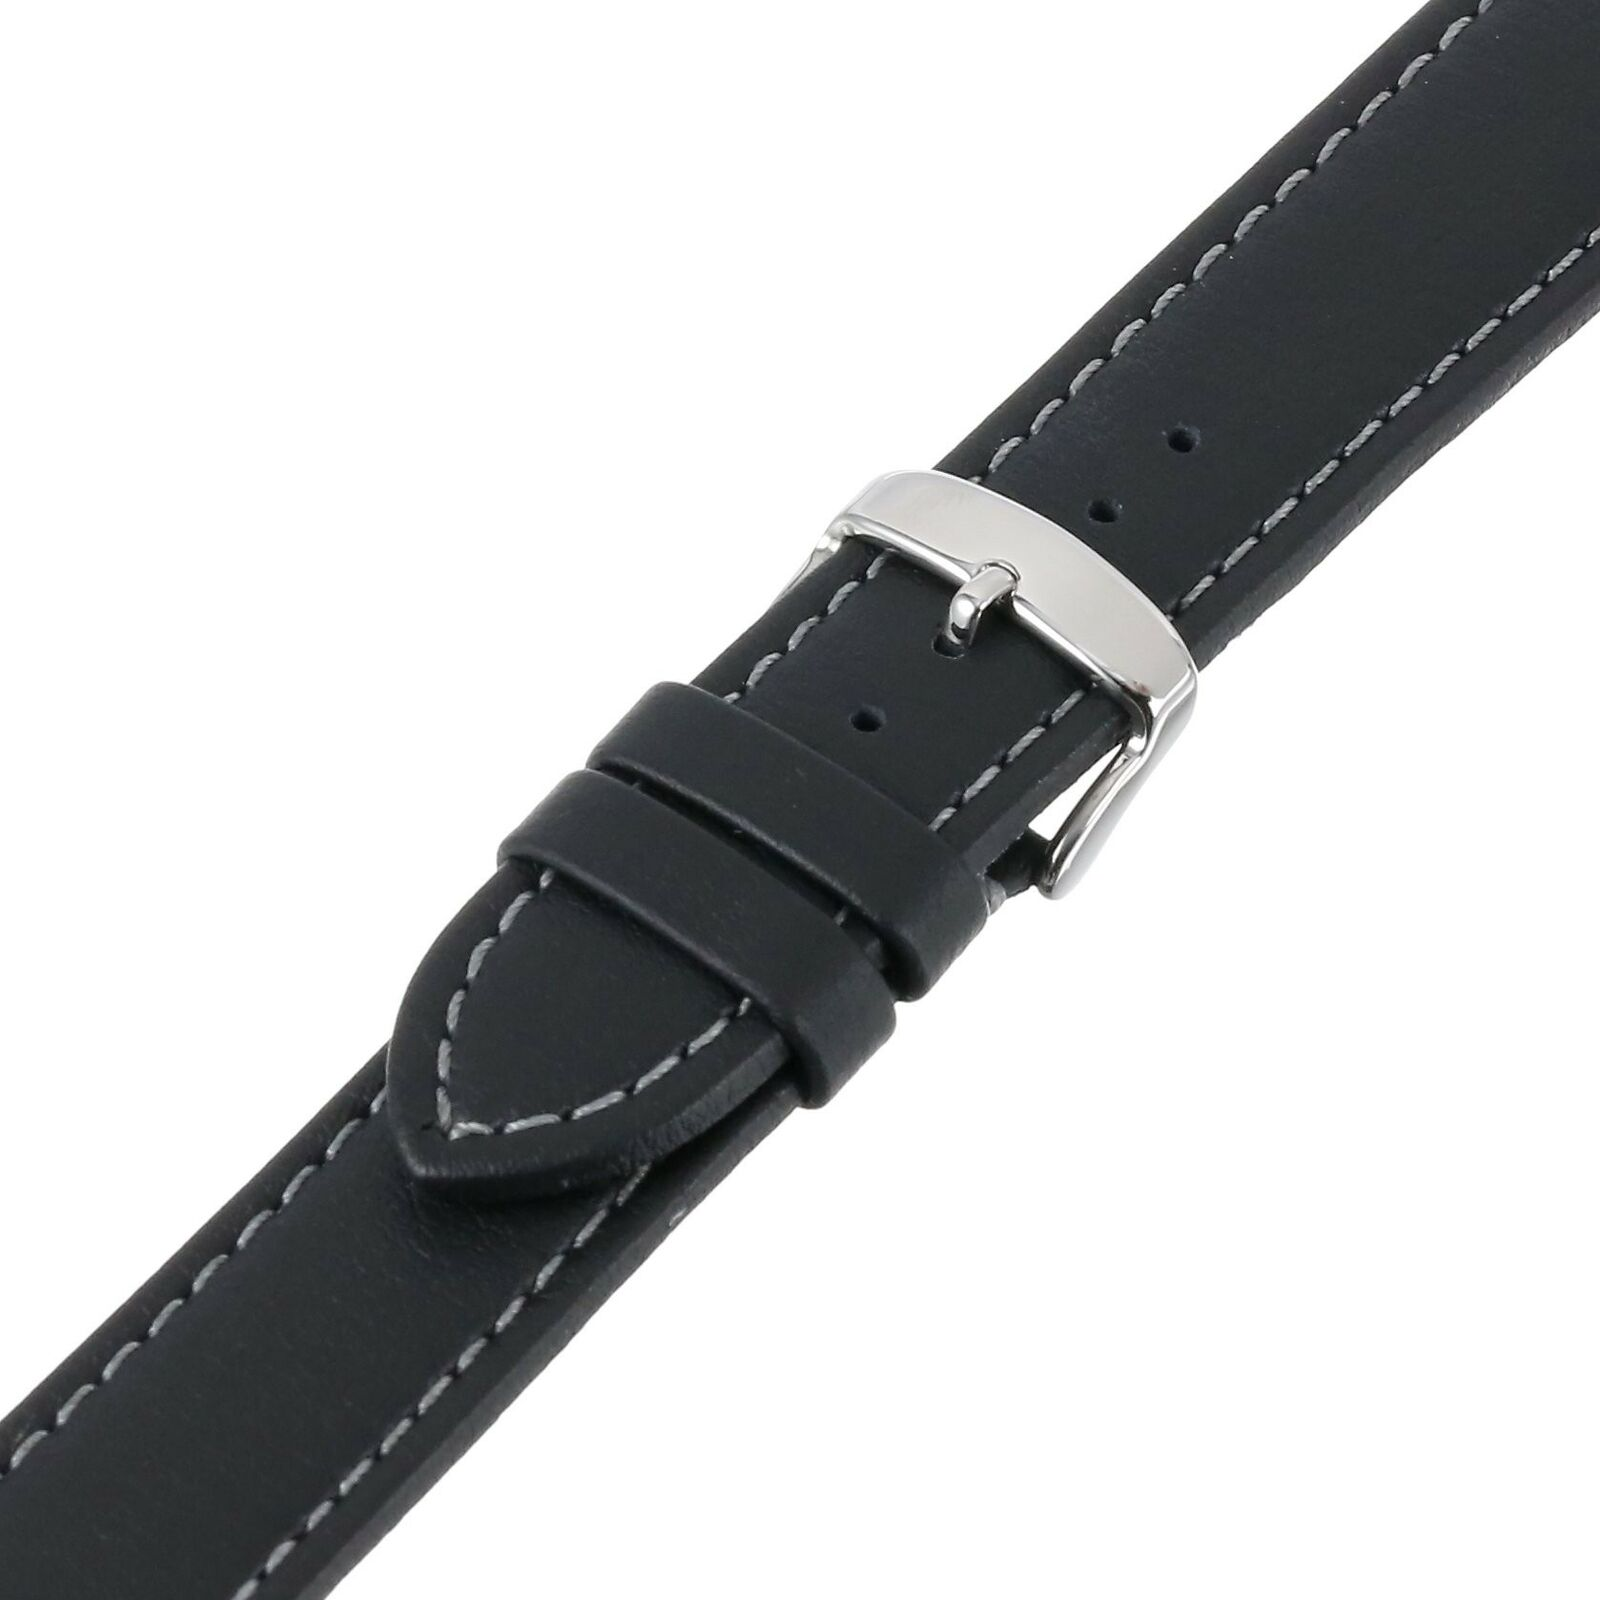 22mm Hadley Roma Genuine Lorica Black Vegan Leather - Invicta Style